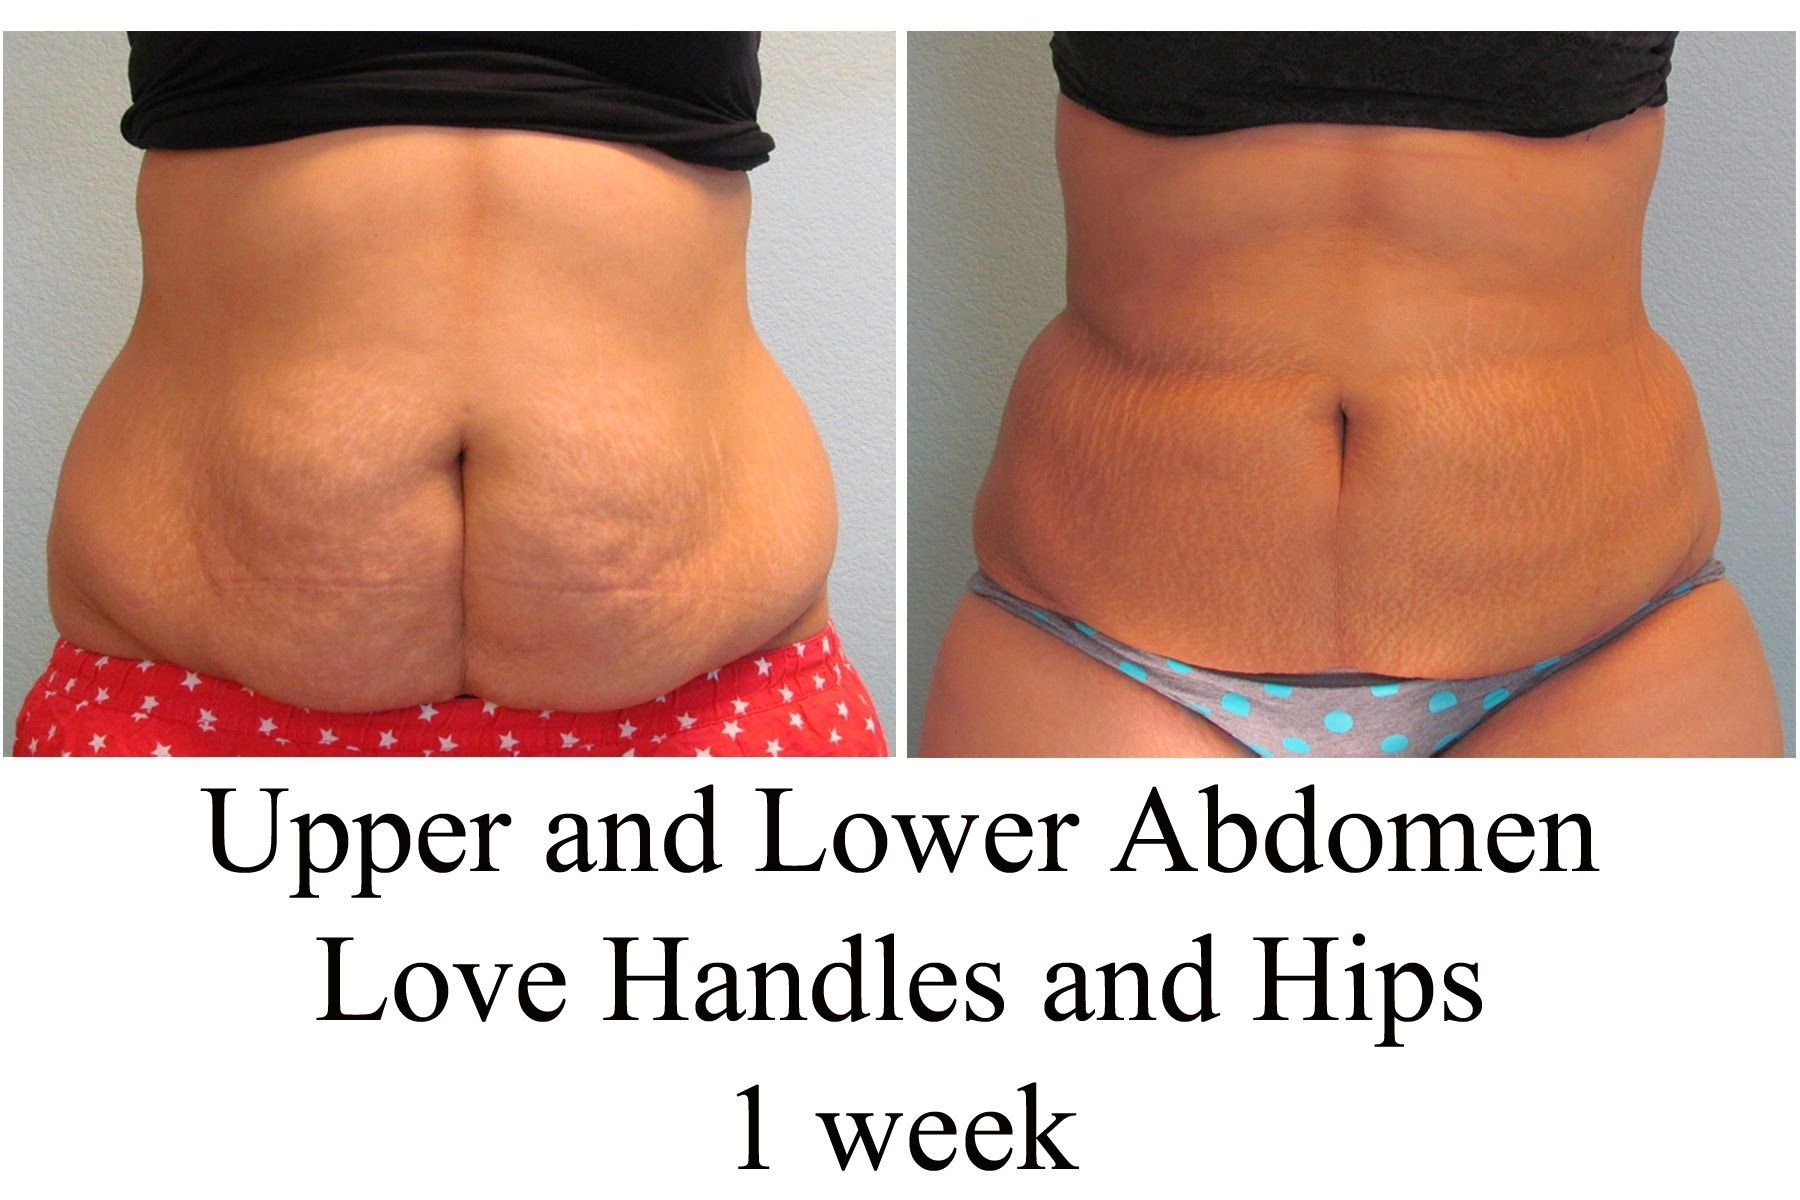 MyShape Lipo - Female Abdominal Liposuction, Employee Liposuction